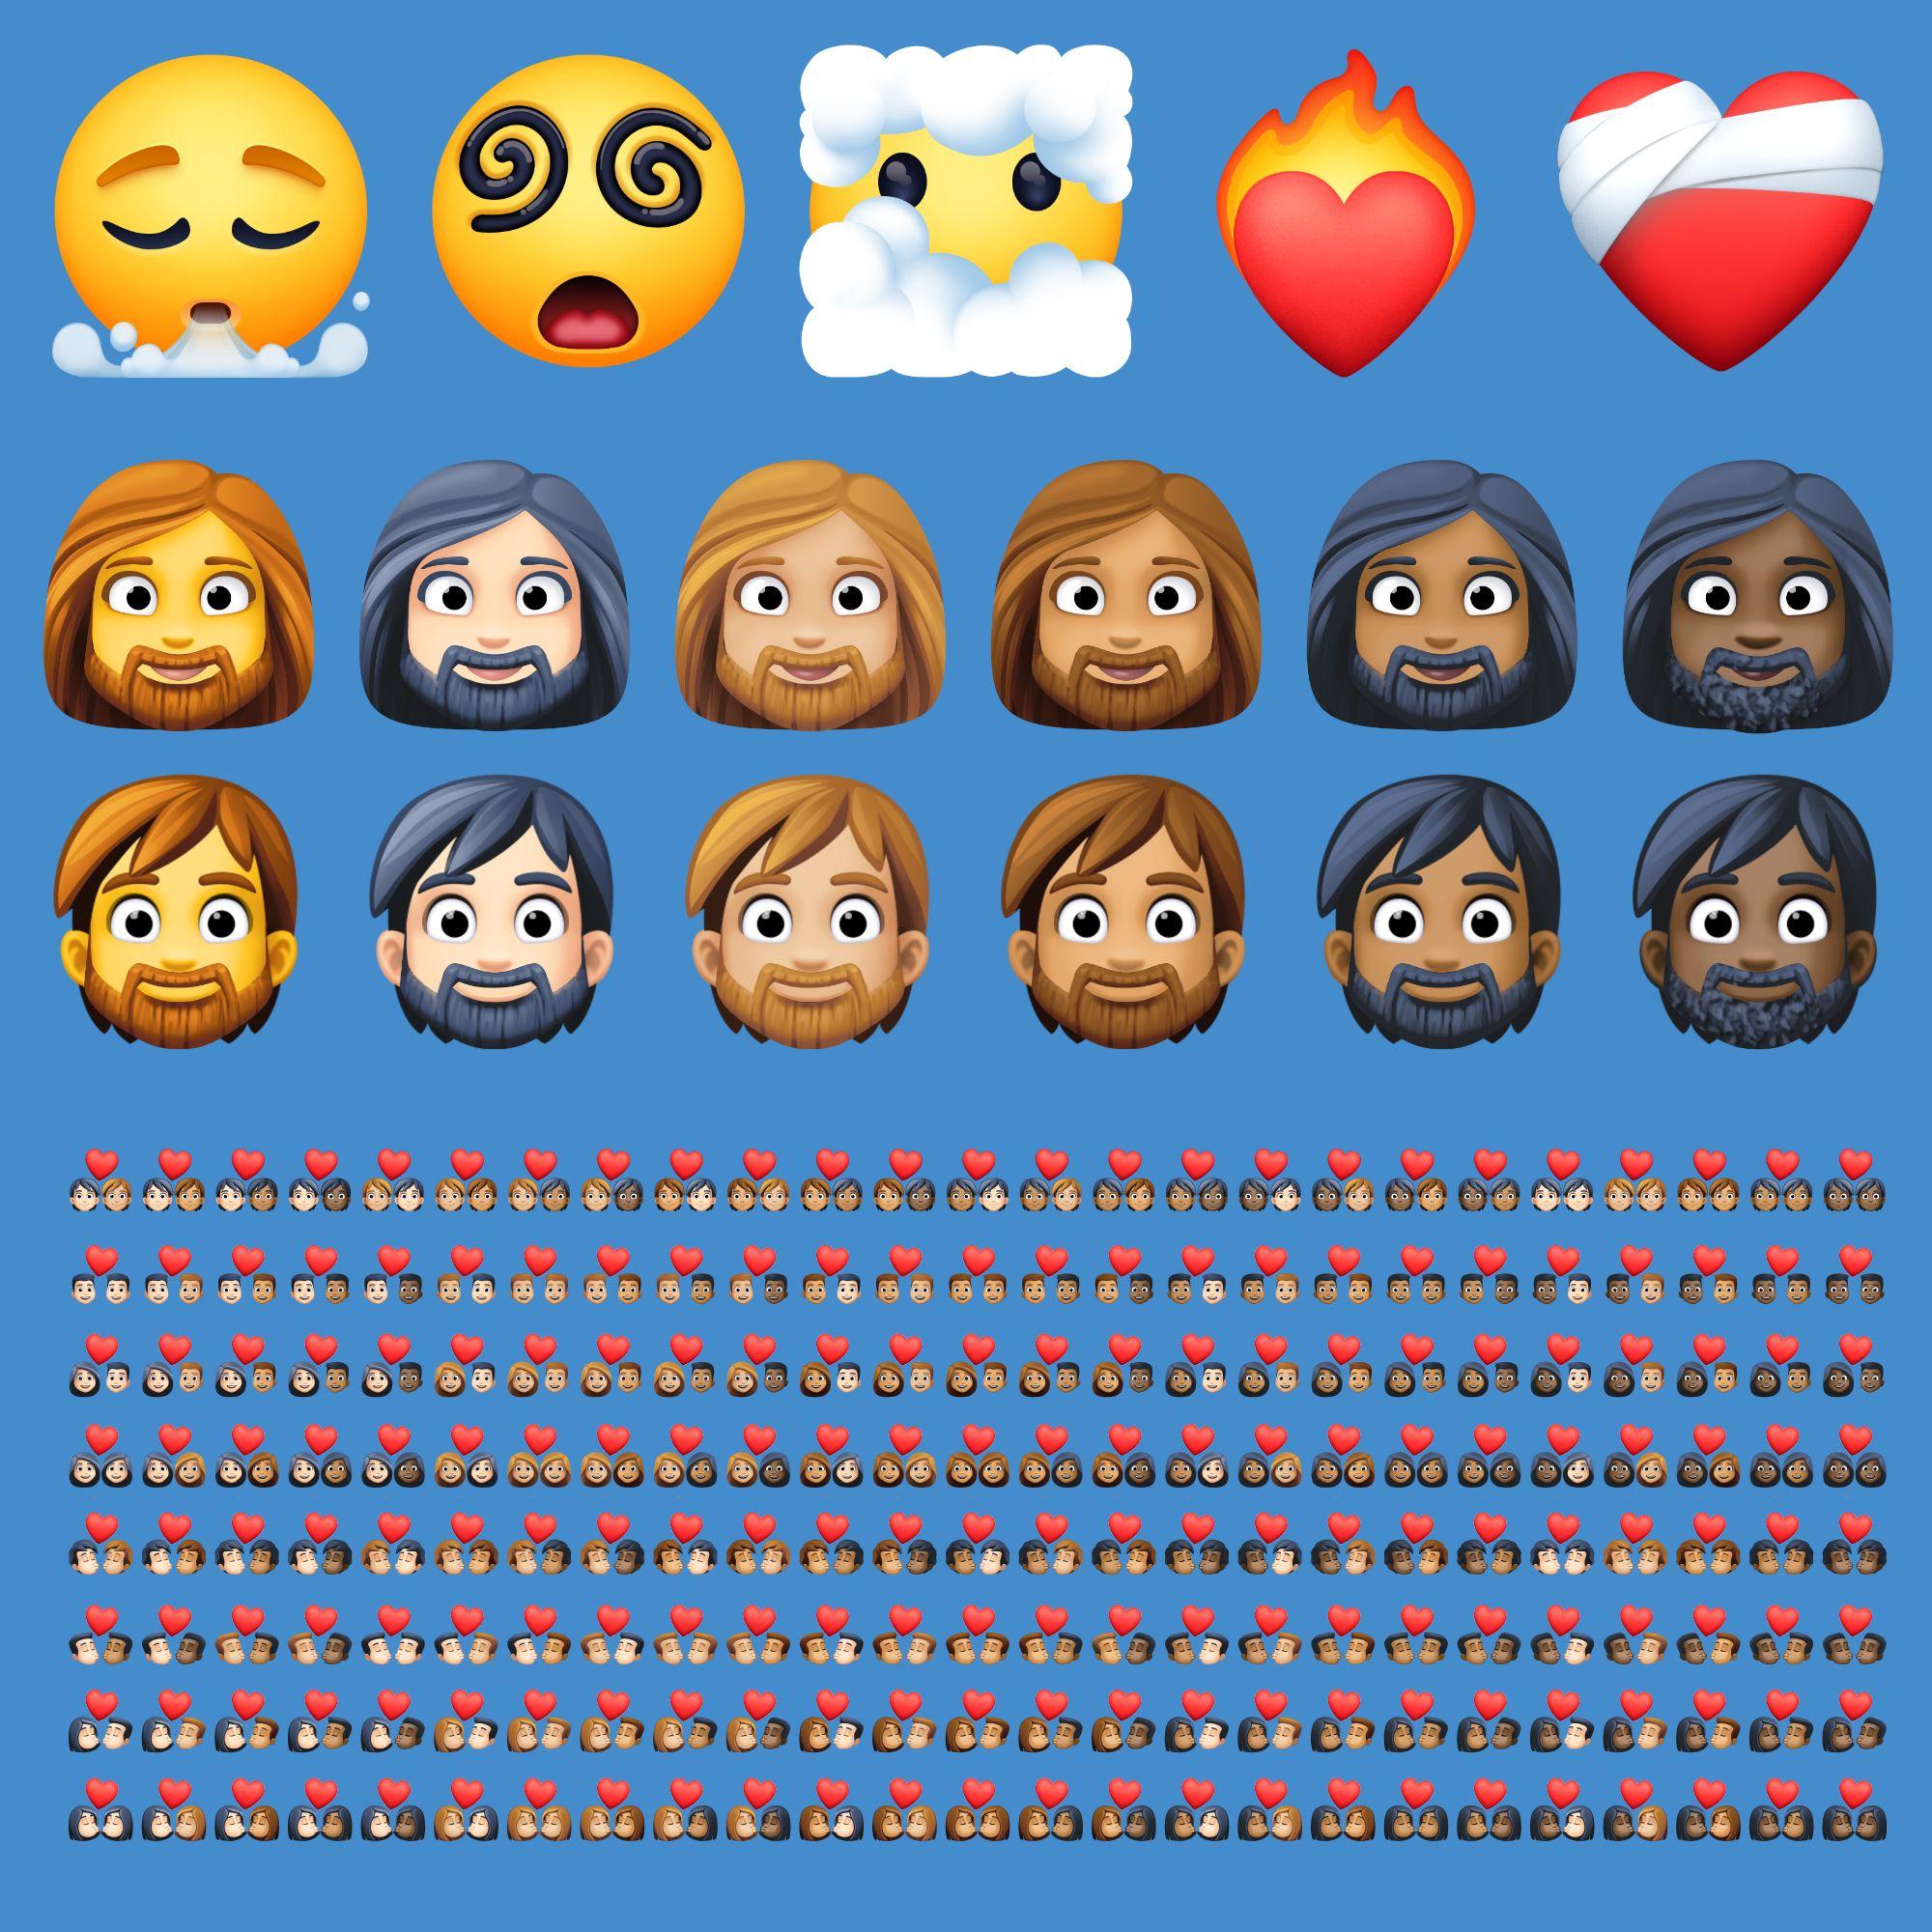 Emojipedia-Facebook-13_1-Emoji-Changelog-All-New-Emojis